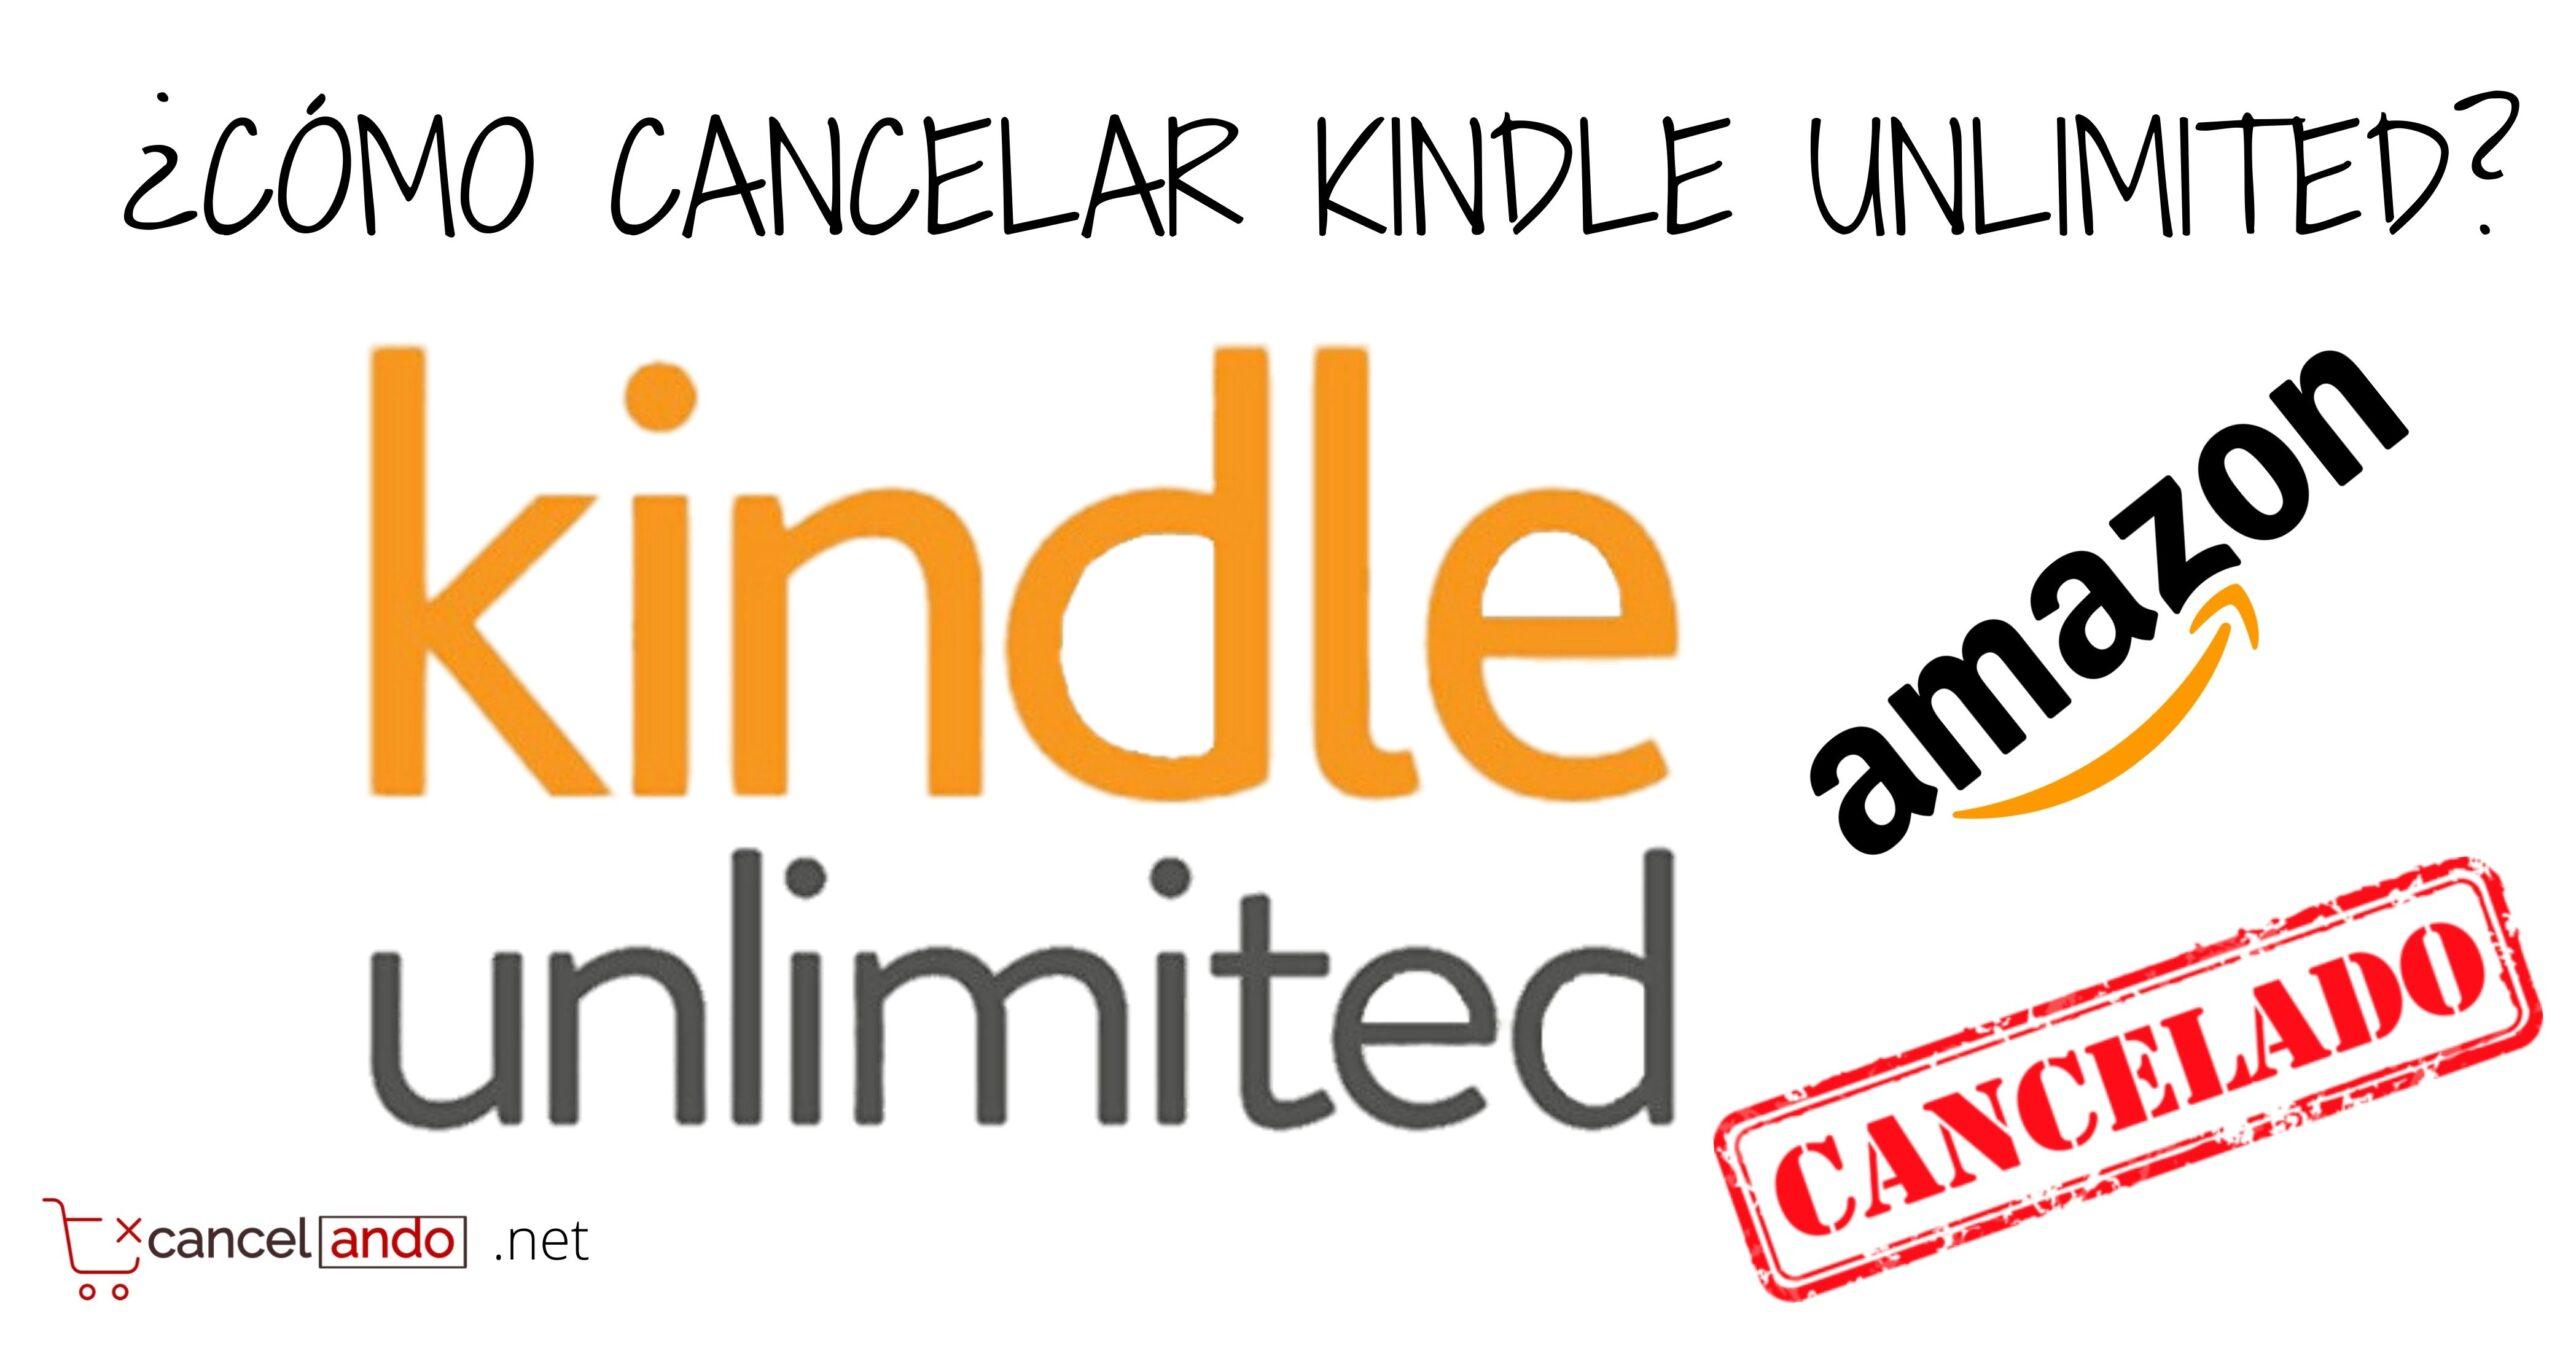 cancelar kindle unlimited